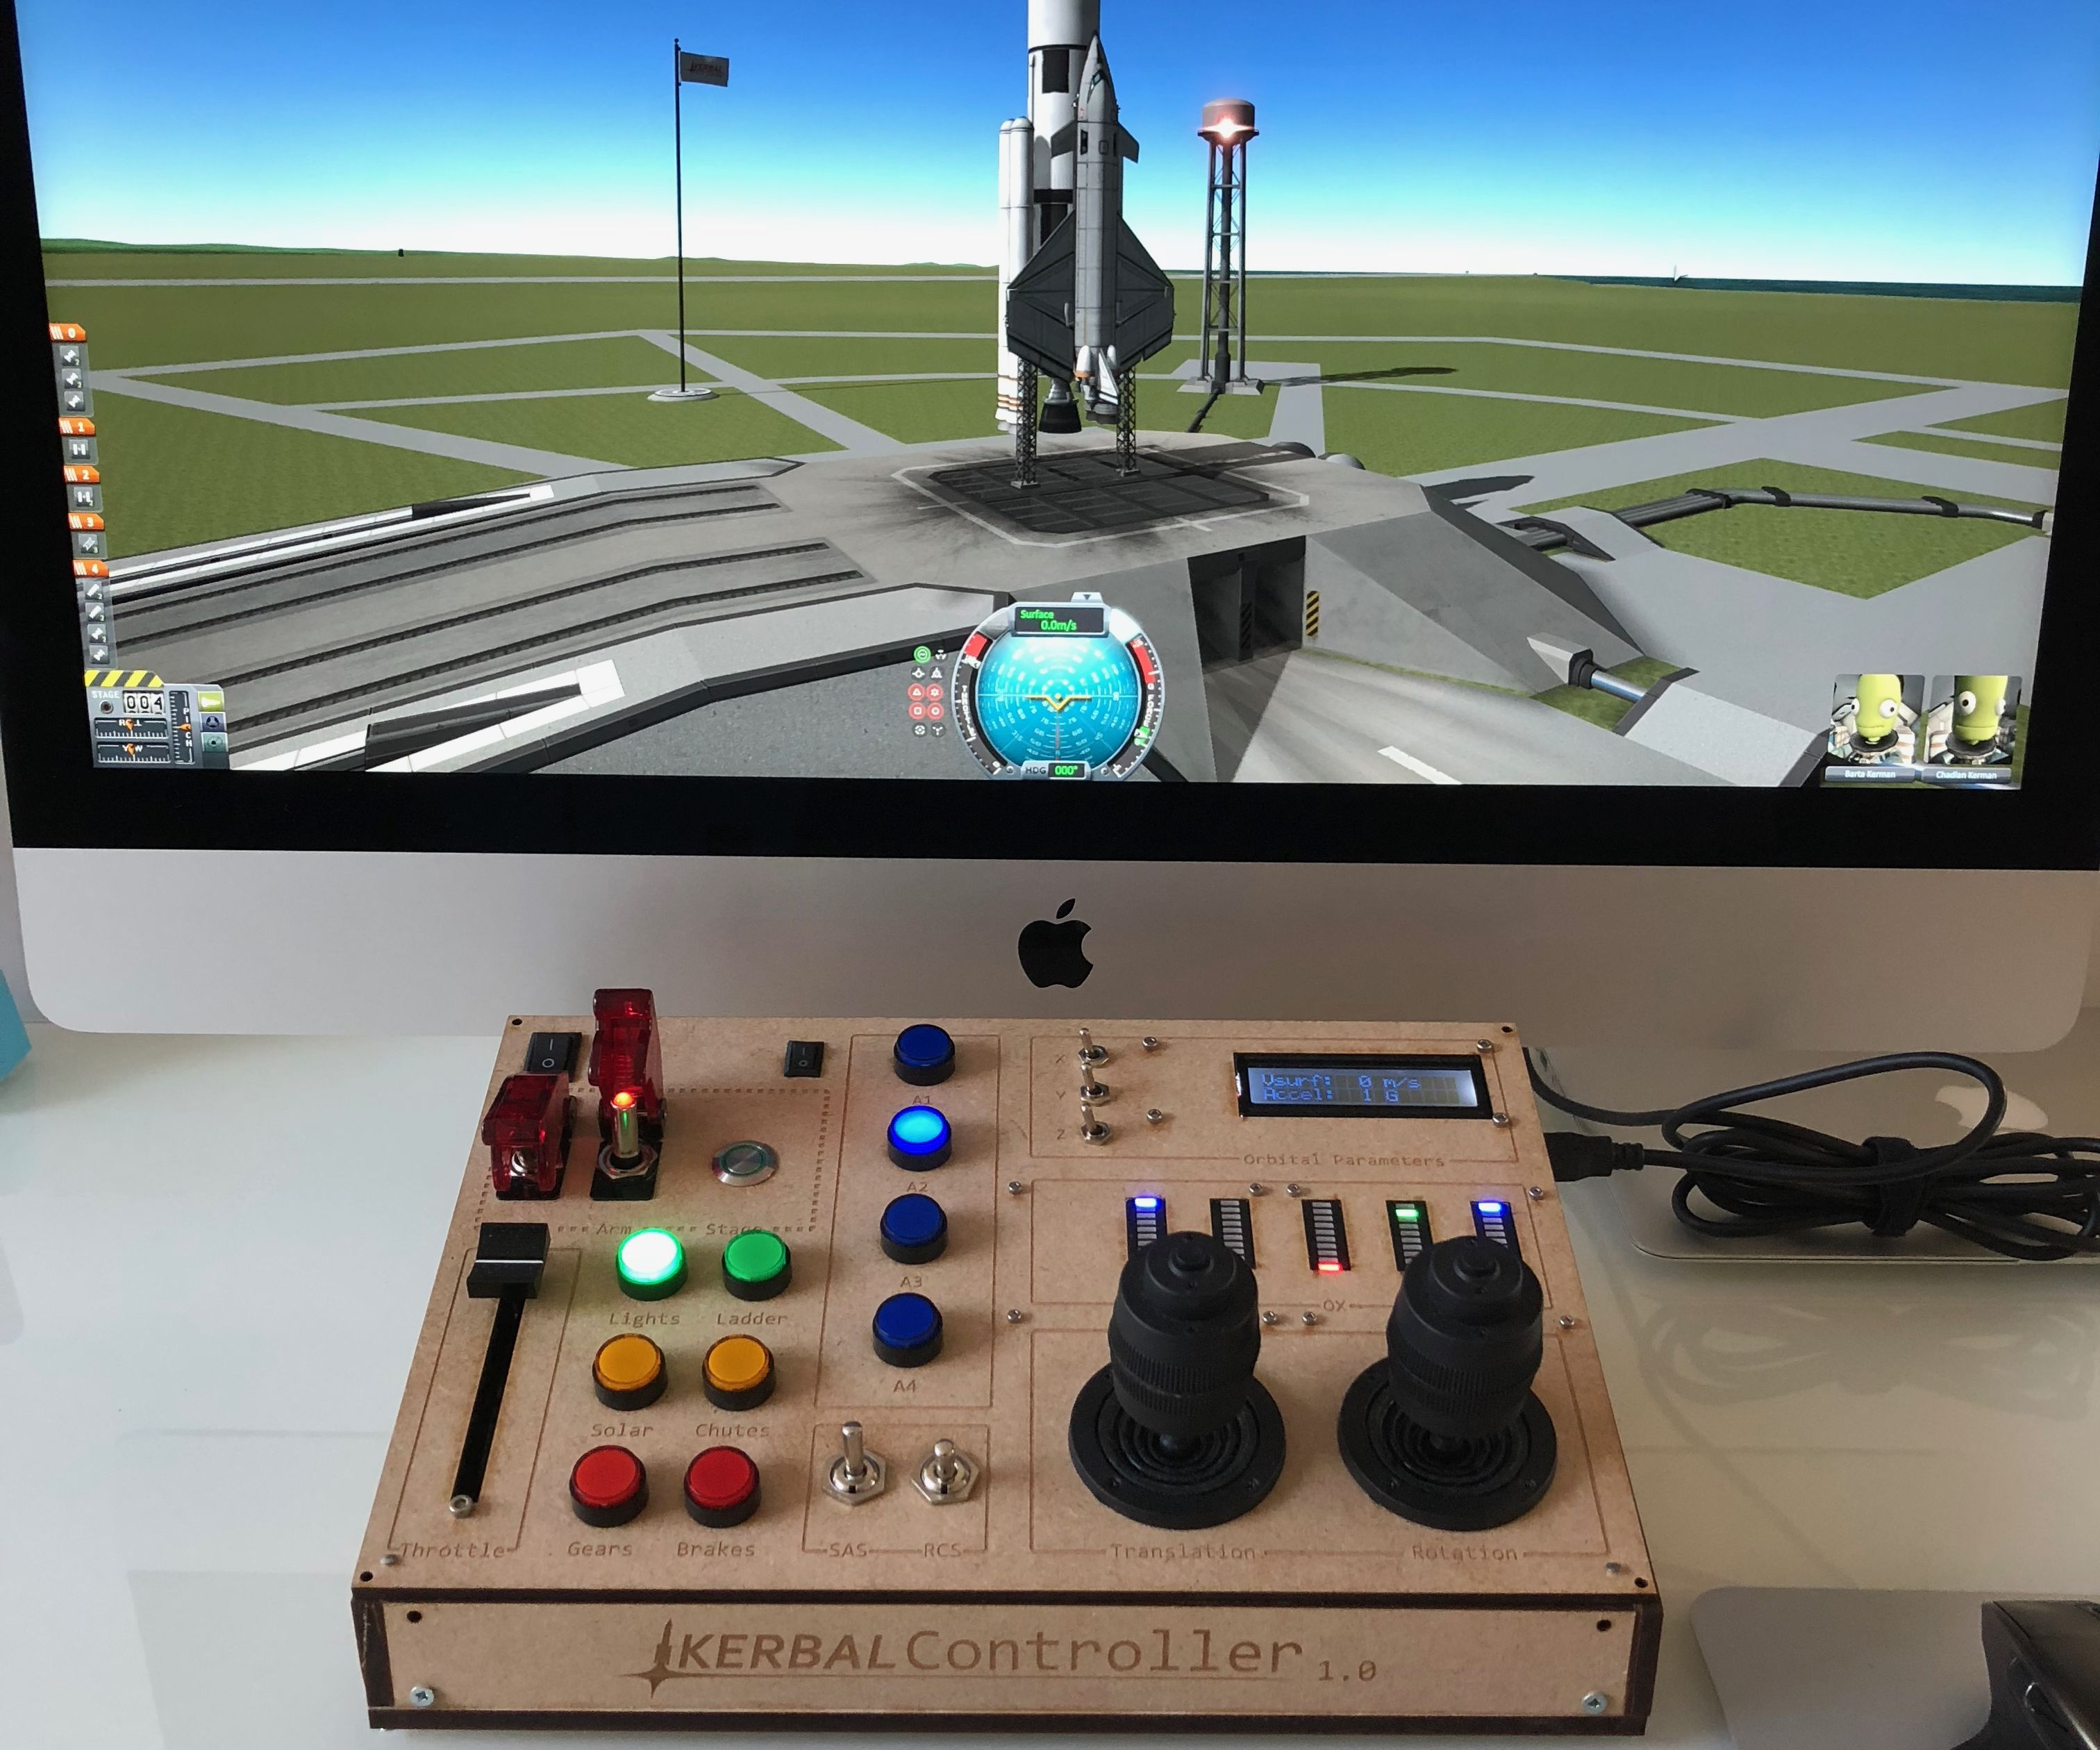 KerbalController: a Custom Control Panel for Rocket Game Kerbal Space Program